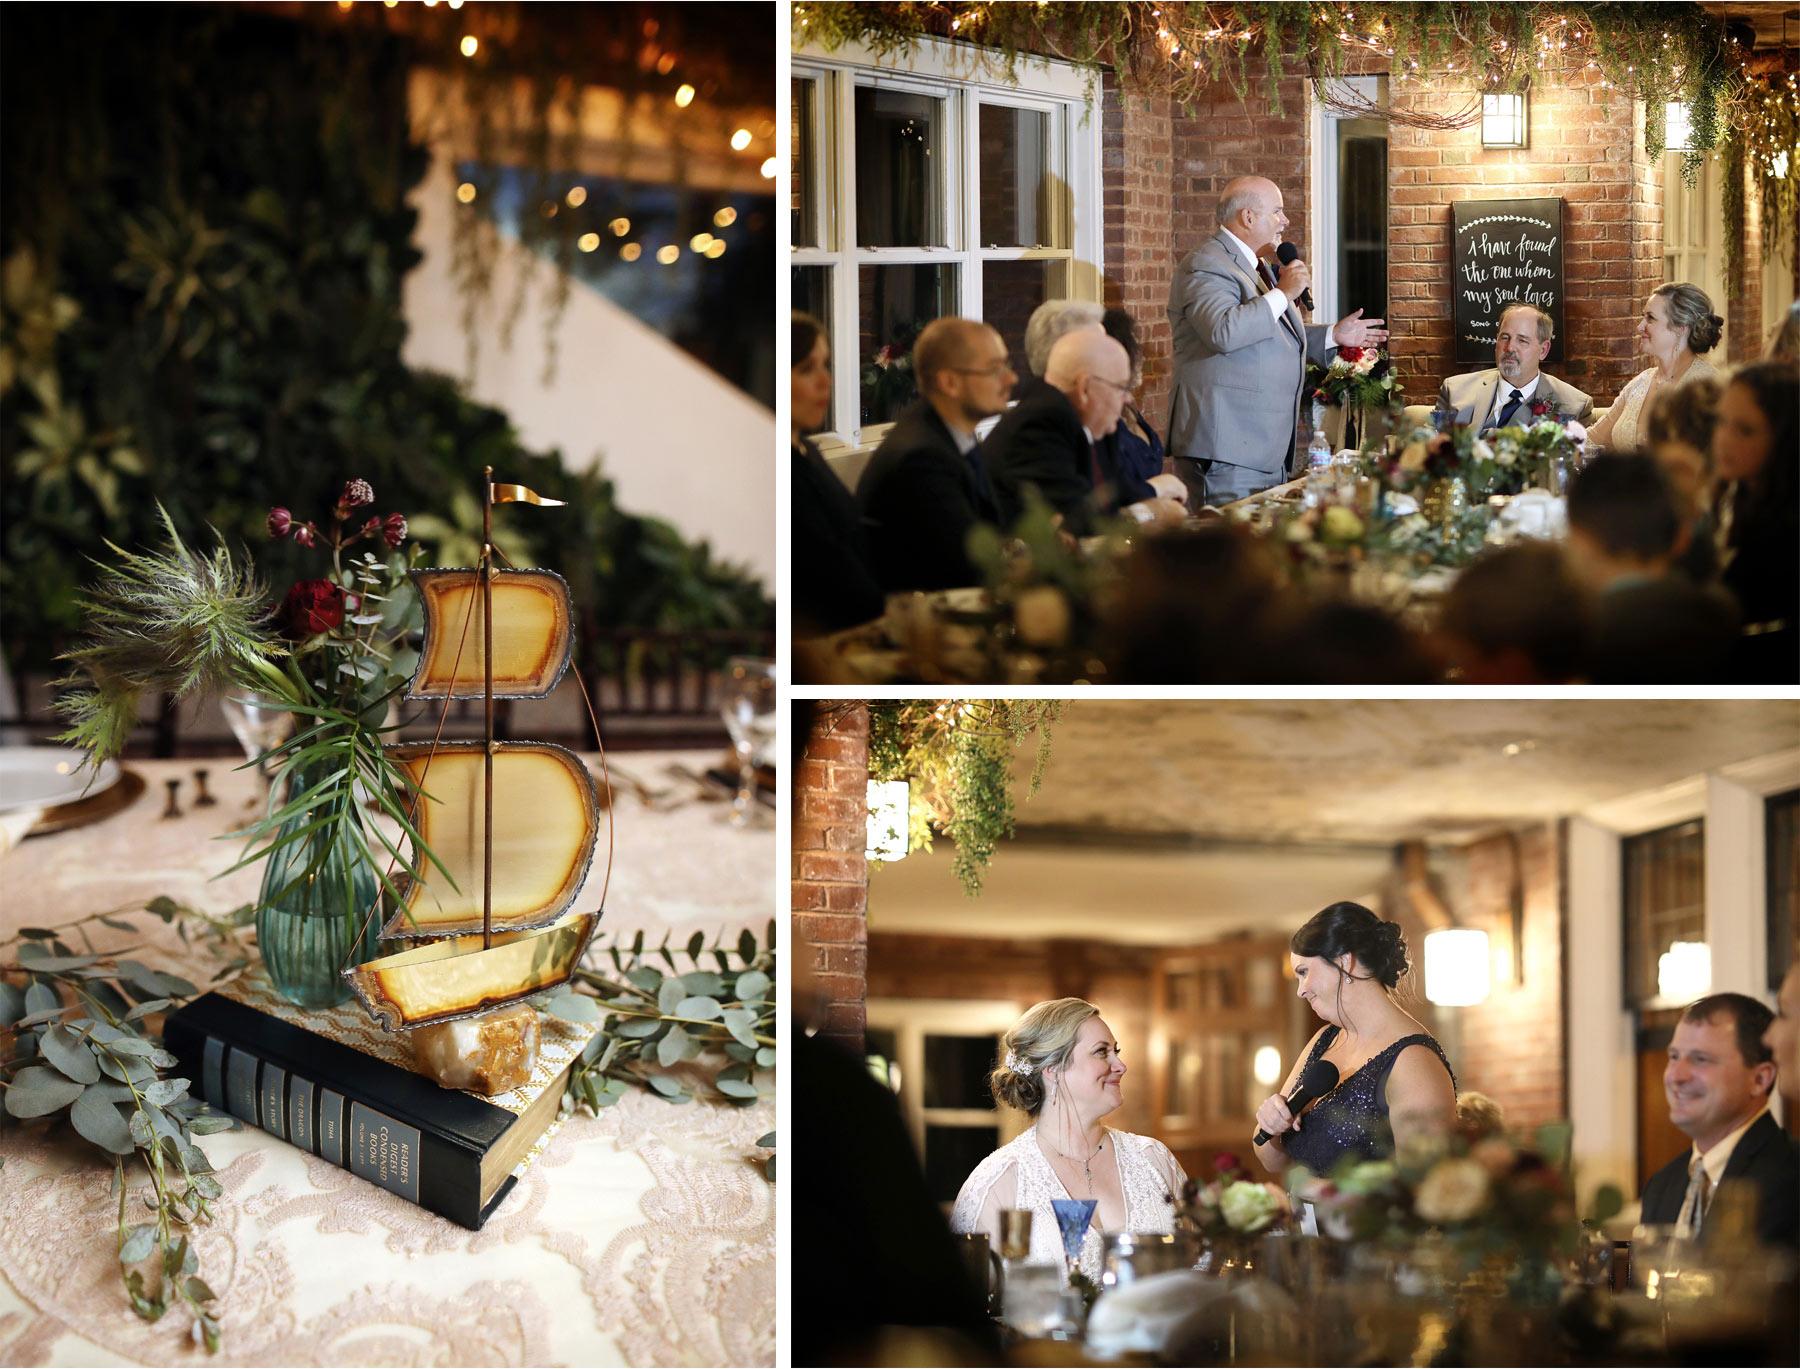 19-Duluth-Minnesota-Wedding-Photography-by-Vick-Photography-Glensheen-Mansion-Reception-Decor-Toasts-Kelli-and-Marc.jpg